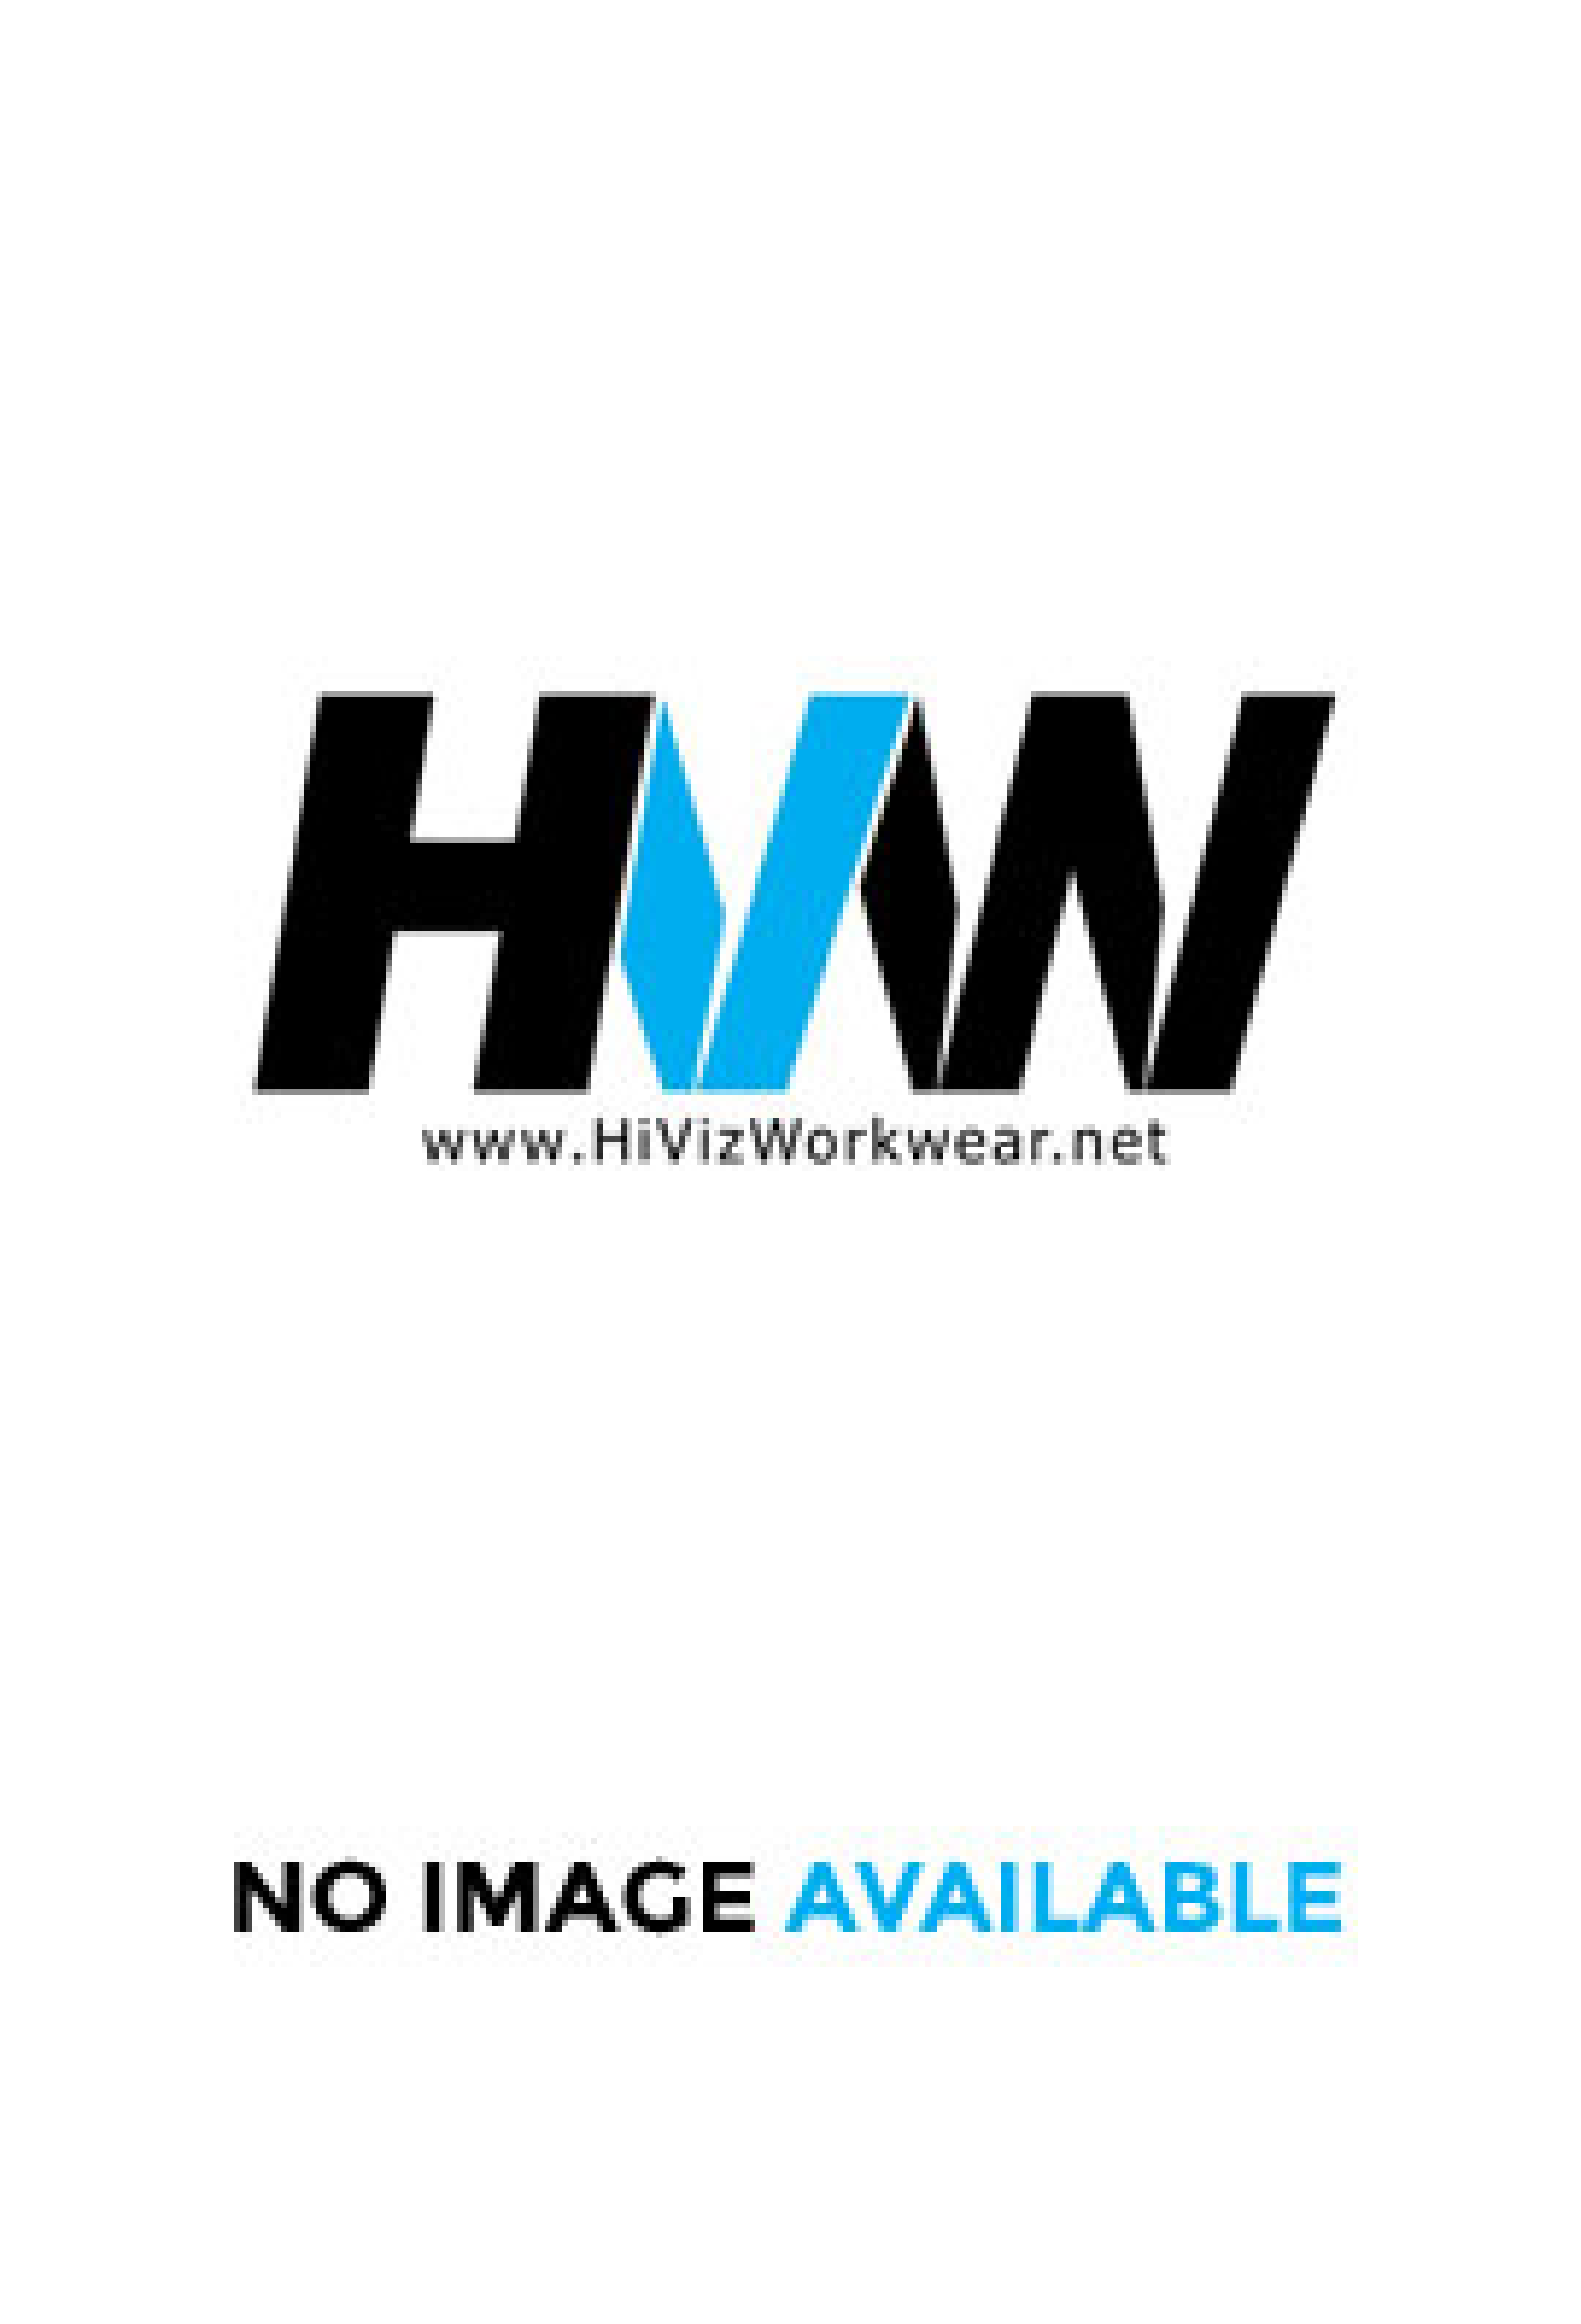 Kustom Kit KK100 Workforce Short Sleeve Shirt  (S To 3XL)  3 COLOURS